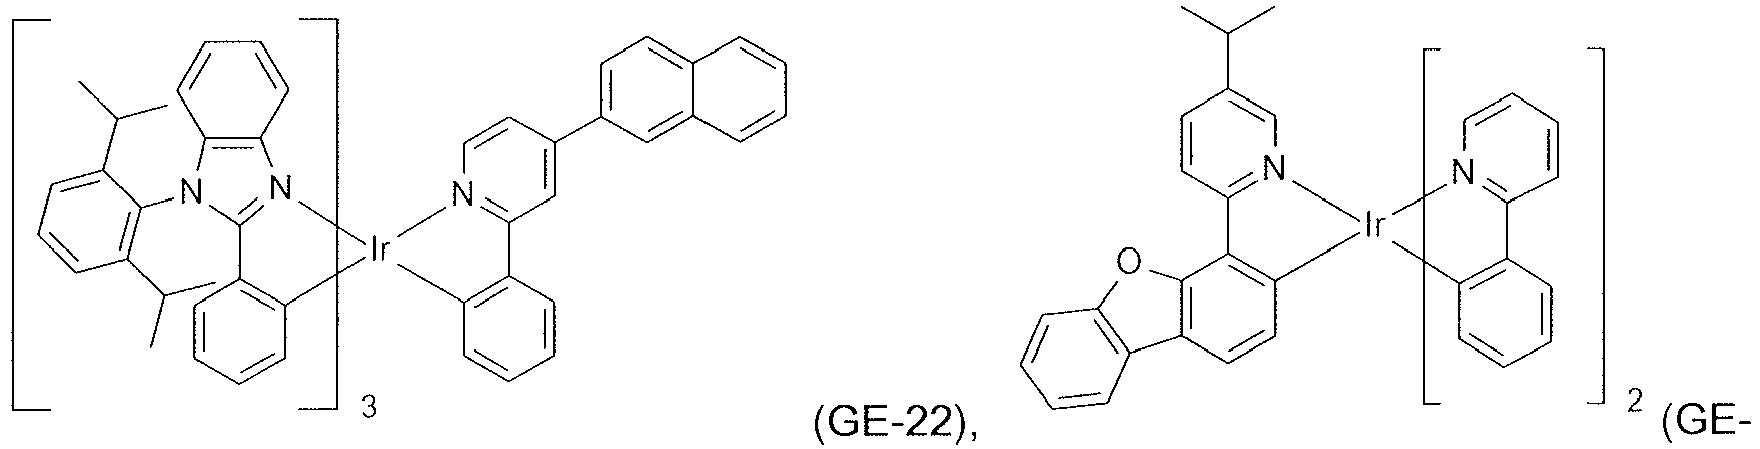 Figure imgb0660